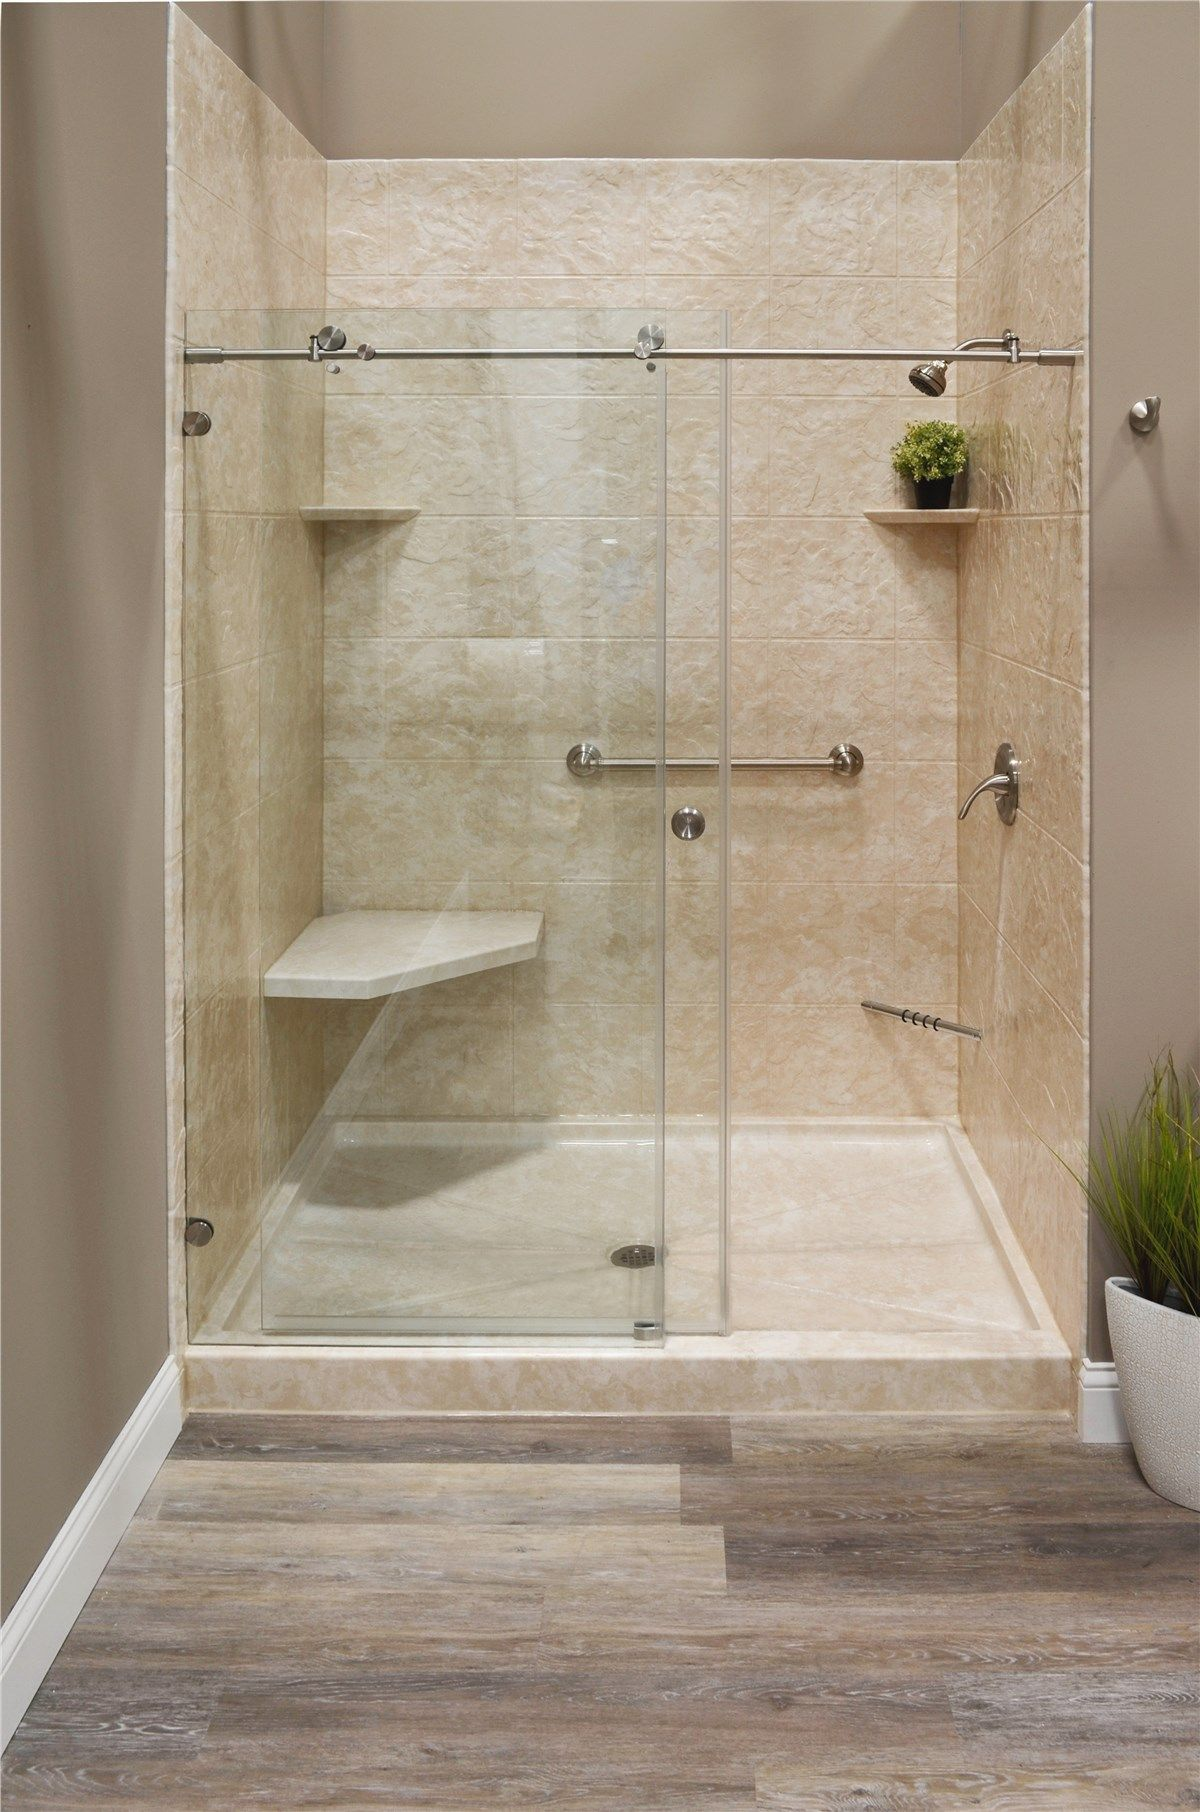 Shower Remodel Home Interior Design Ideas In 2020 Tub To Shower Conversion Bathroom Remodel Shower Shower Remodel